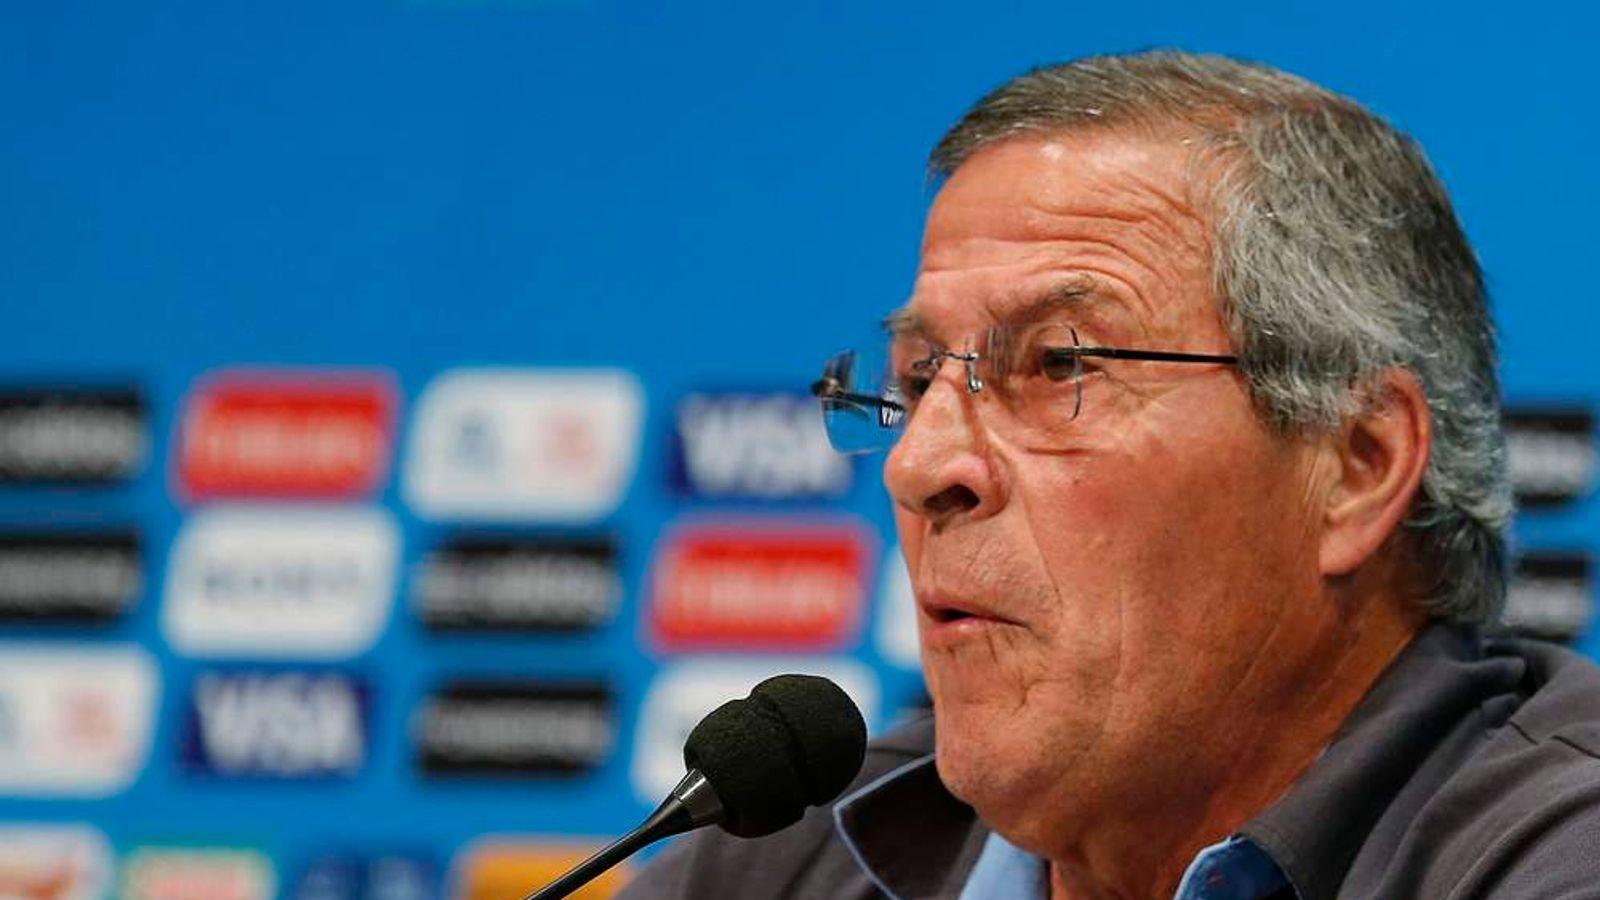 Uruguay's head coach Oscar Tabarez speaks during a news conference in Rio de Janeiro